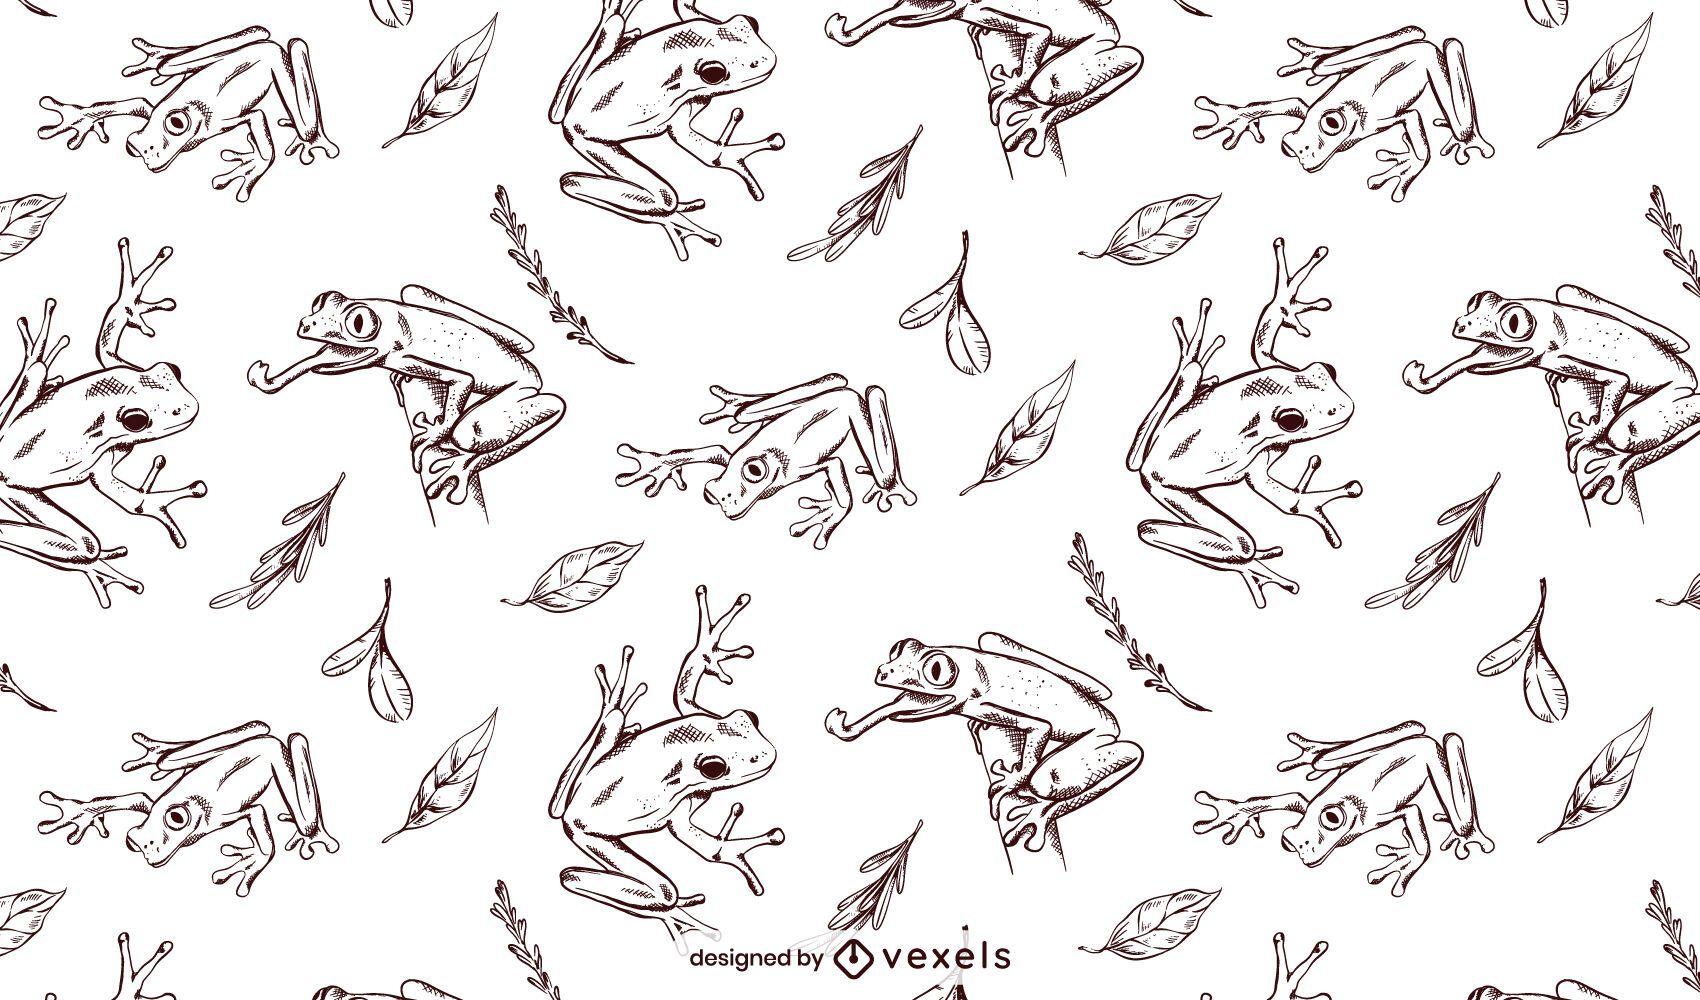 Hand drawn frog pattern design